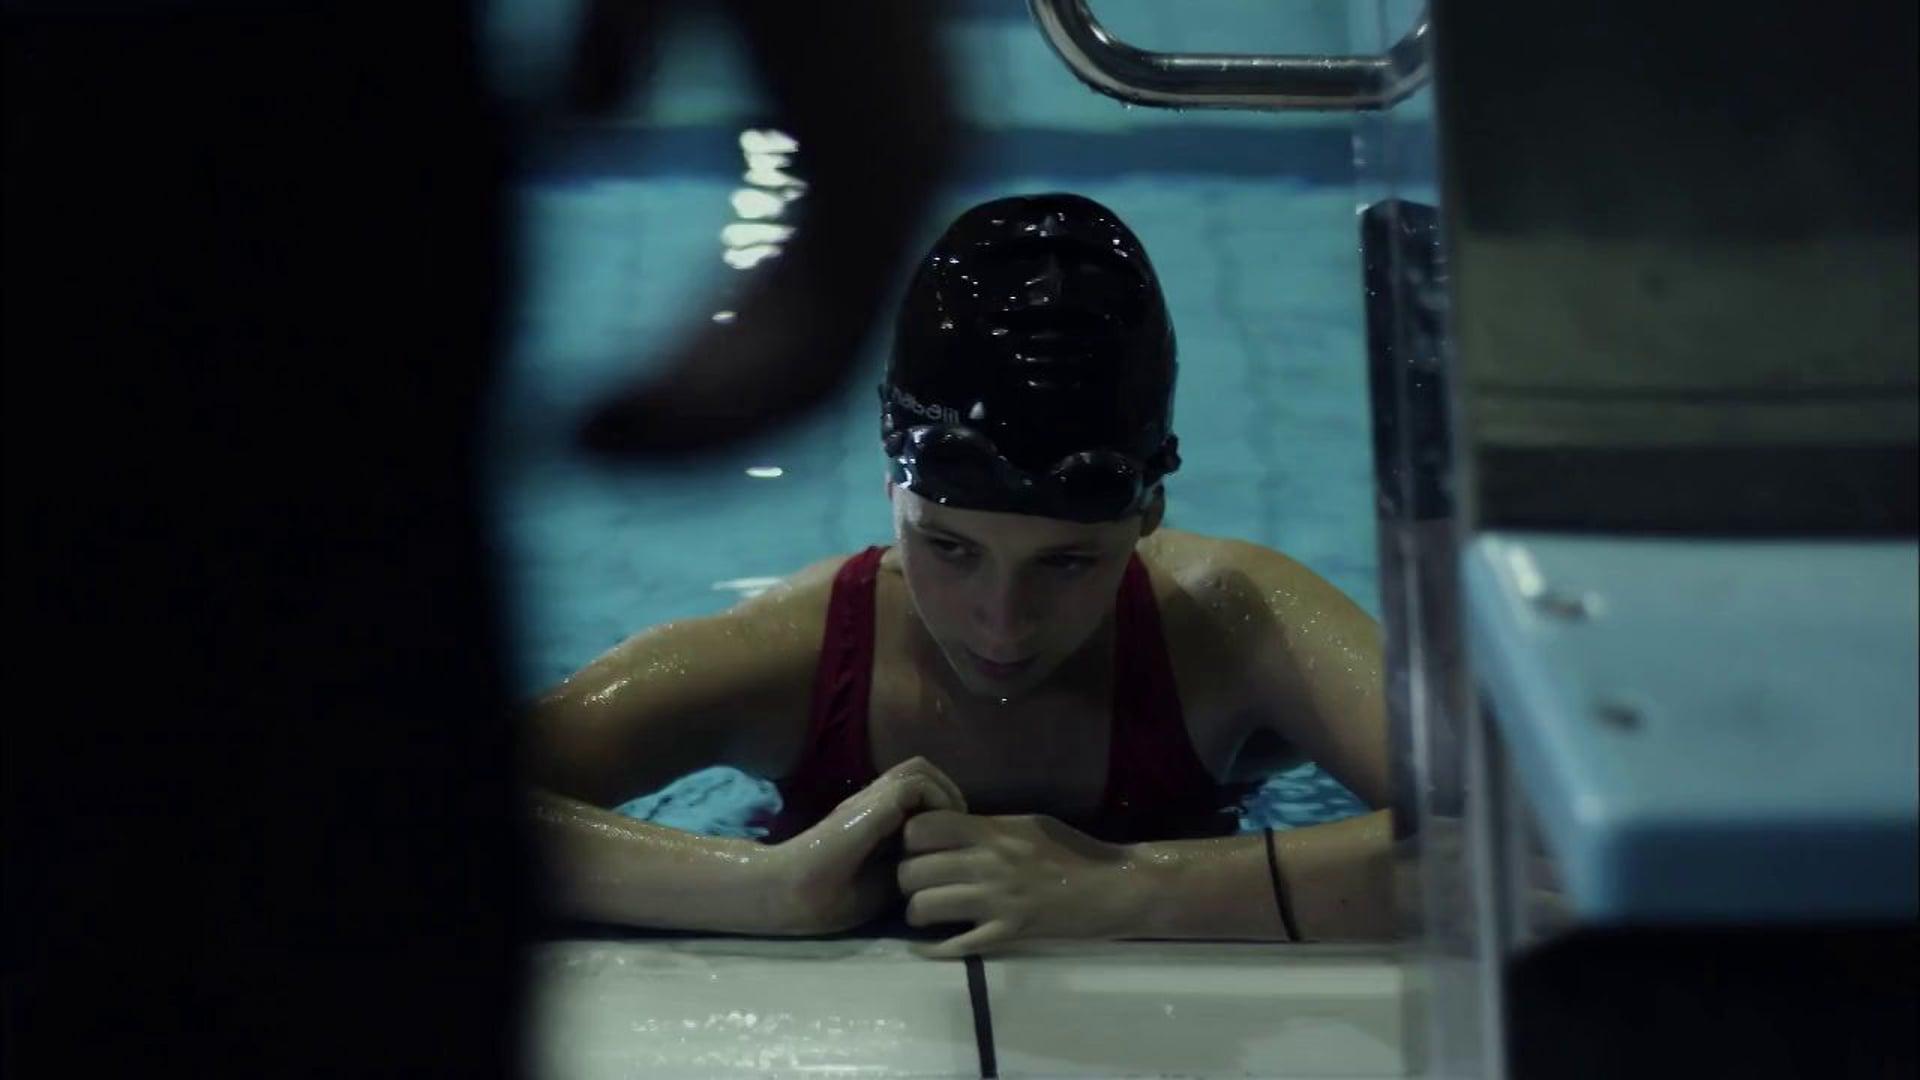 Trailer cortometraje ADRI (Estibaliz Urresola)